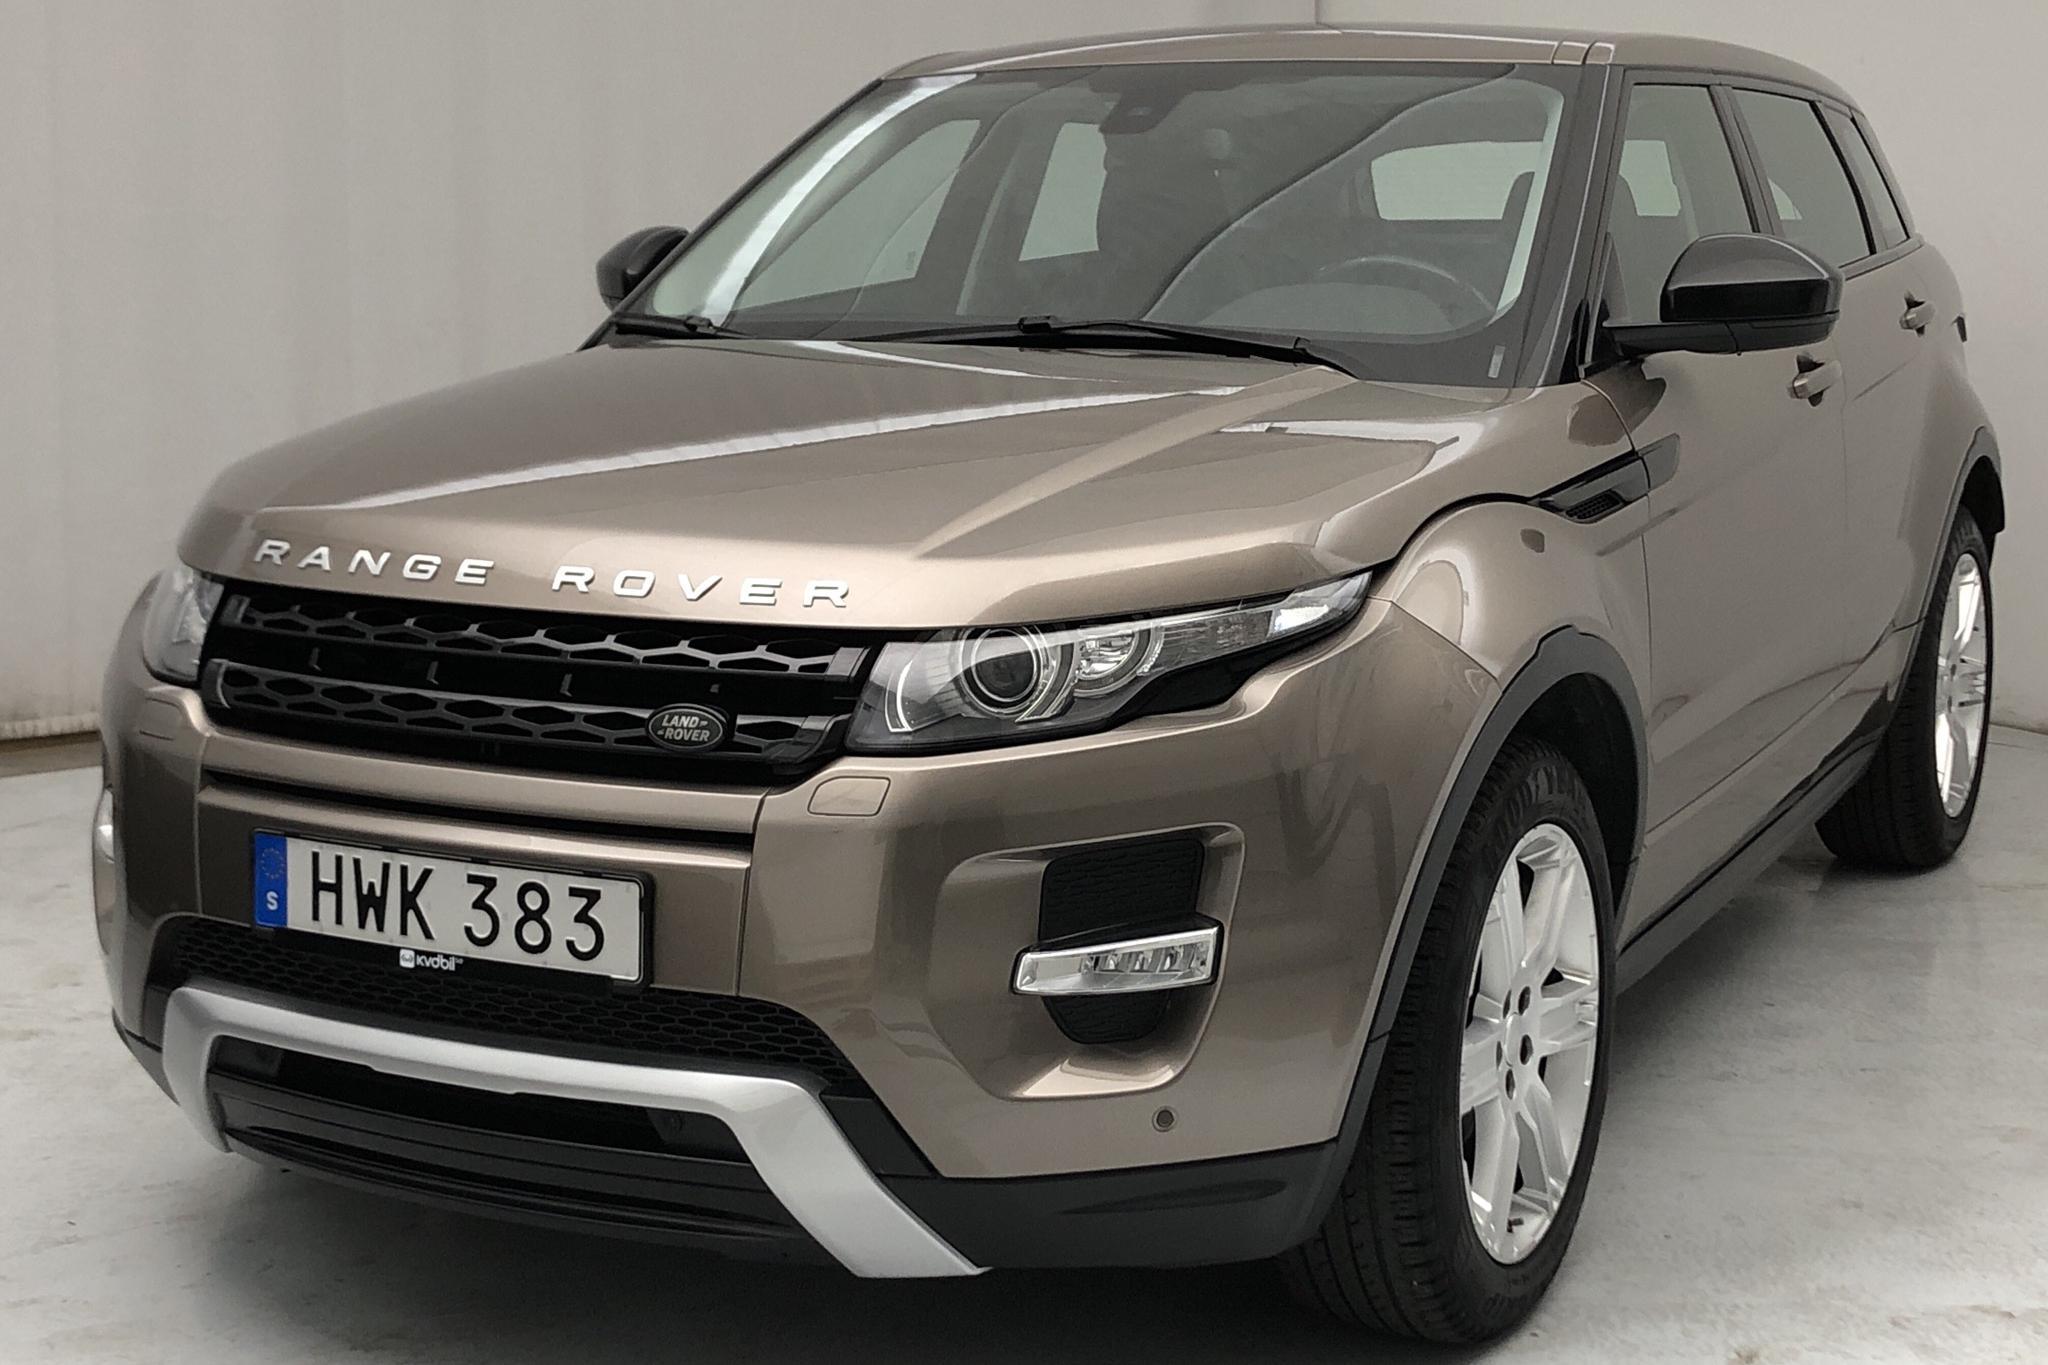 Land Rover Range Rover Evoque 2.2 SD4 5dr (190hk) - 11 021 mil - Automat - grå - 2015